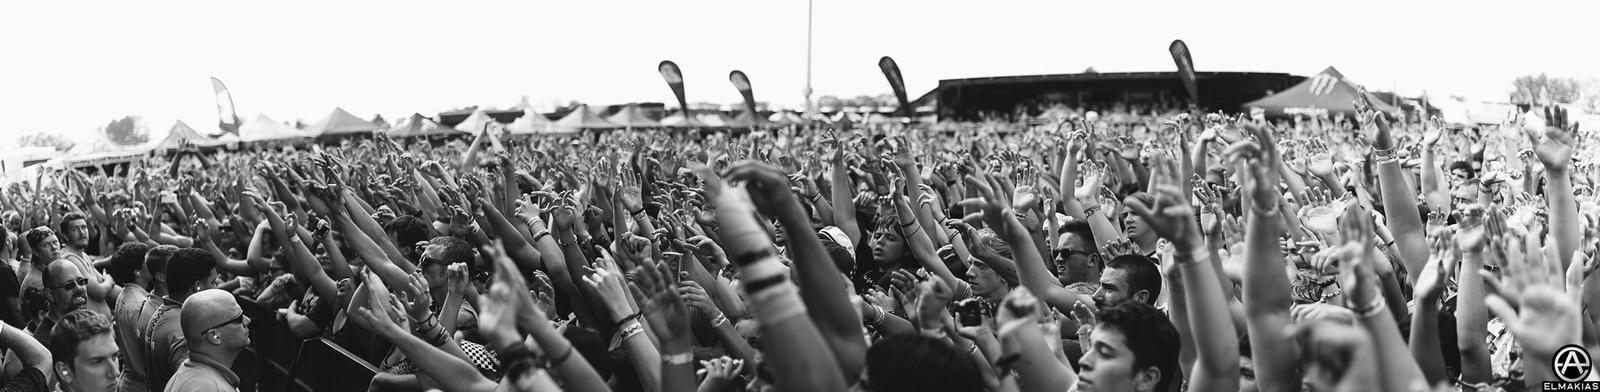 Beartooth fans at Vans Warped Tour 2015 by Adam Elmakias